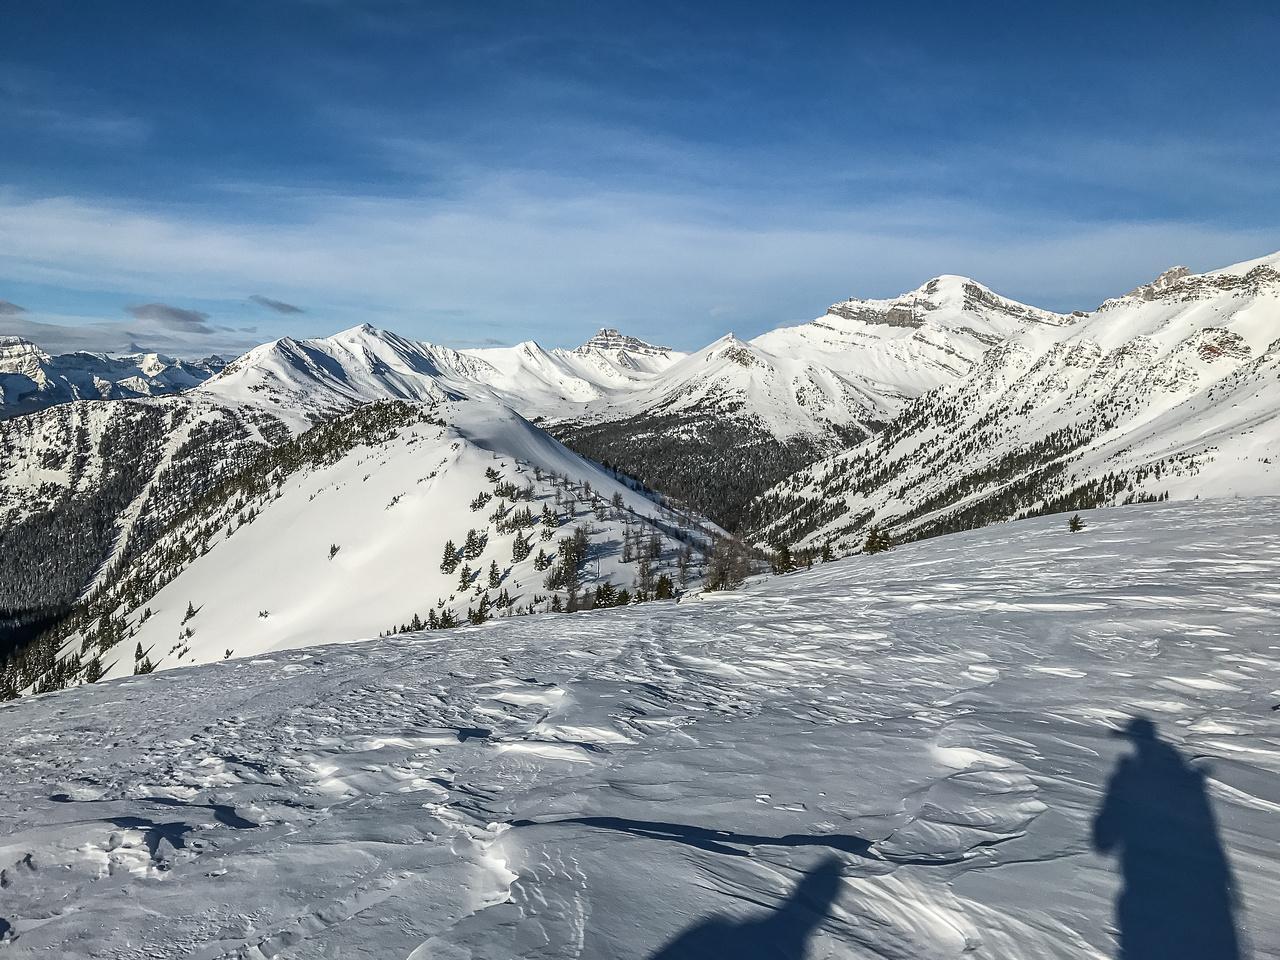 A slight descent towards Wolverine Ridge.